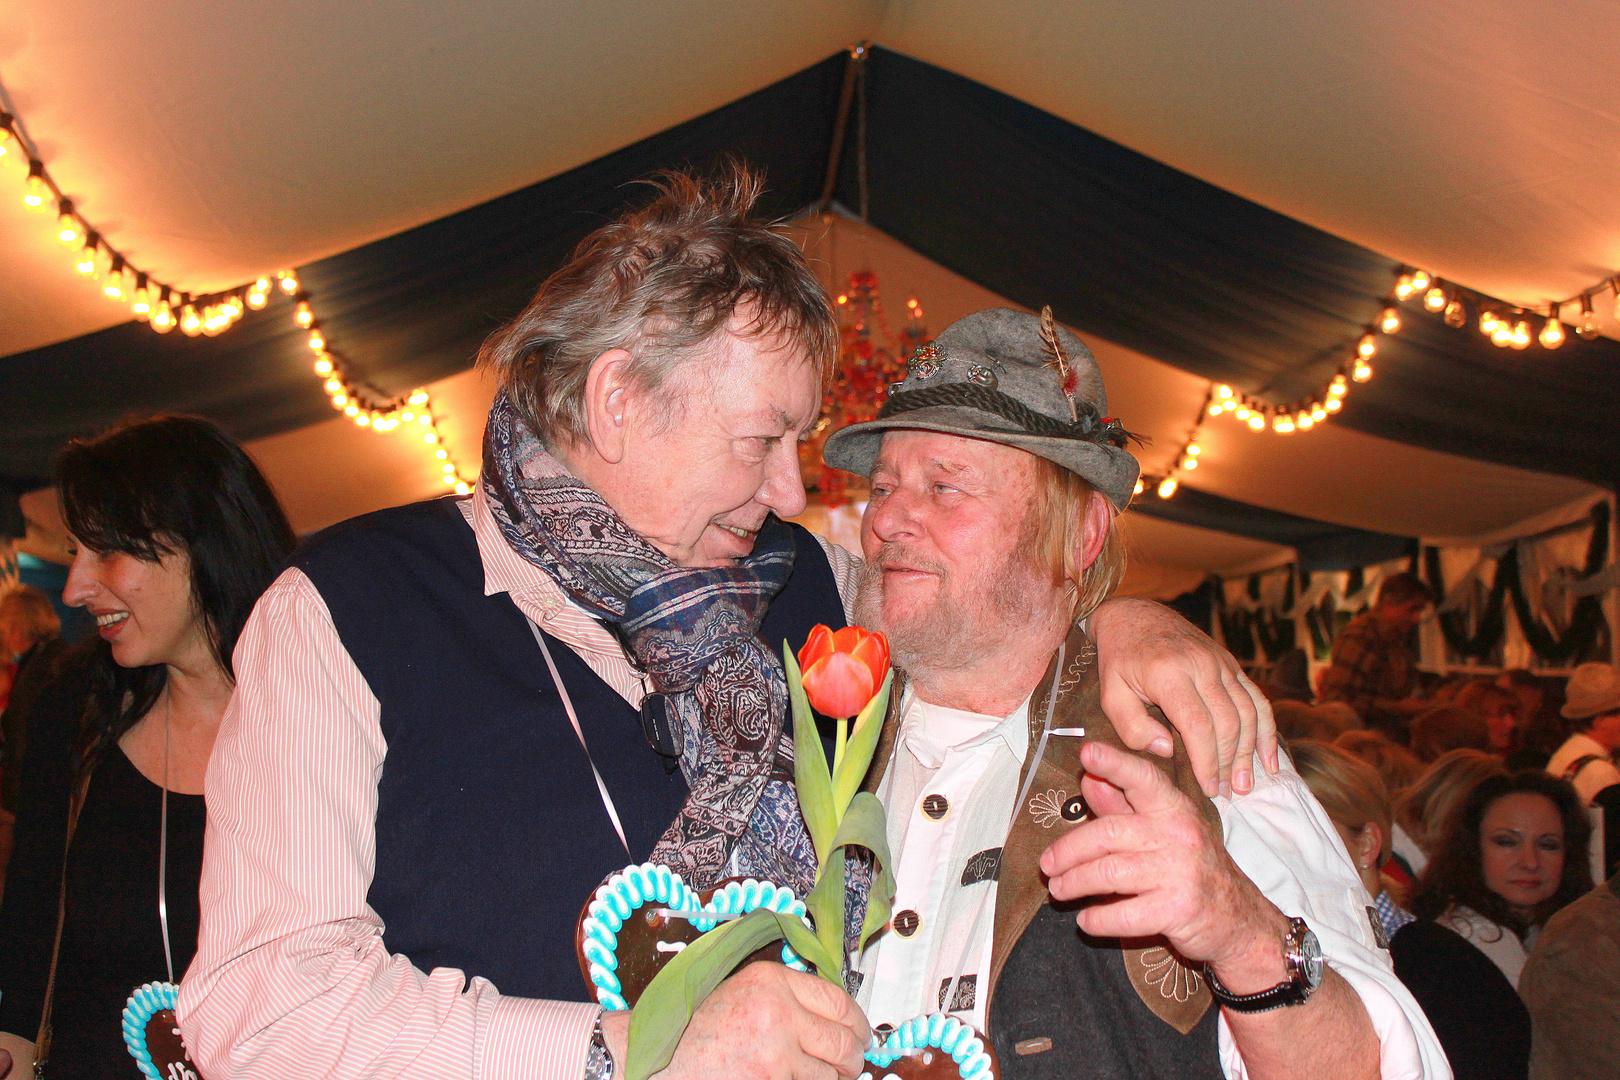 Hans Böhrs & Werner Böhm